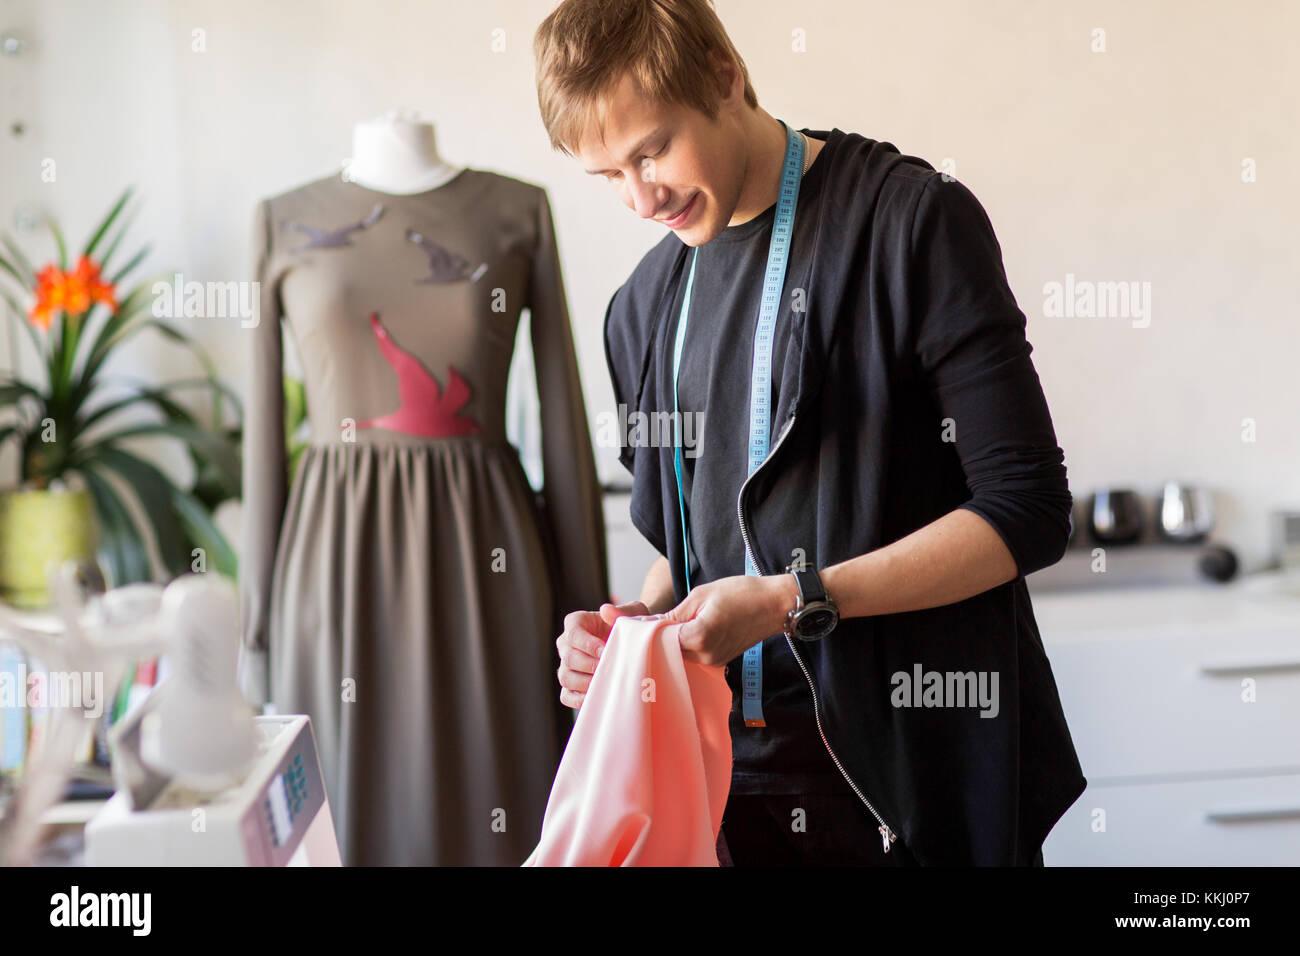 fashion designer with cloth making dress at studio - Stock Image